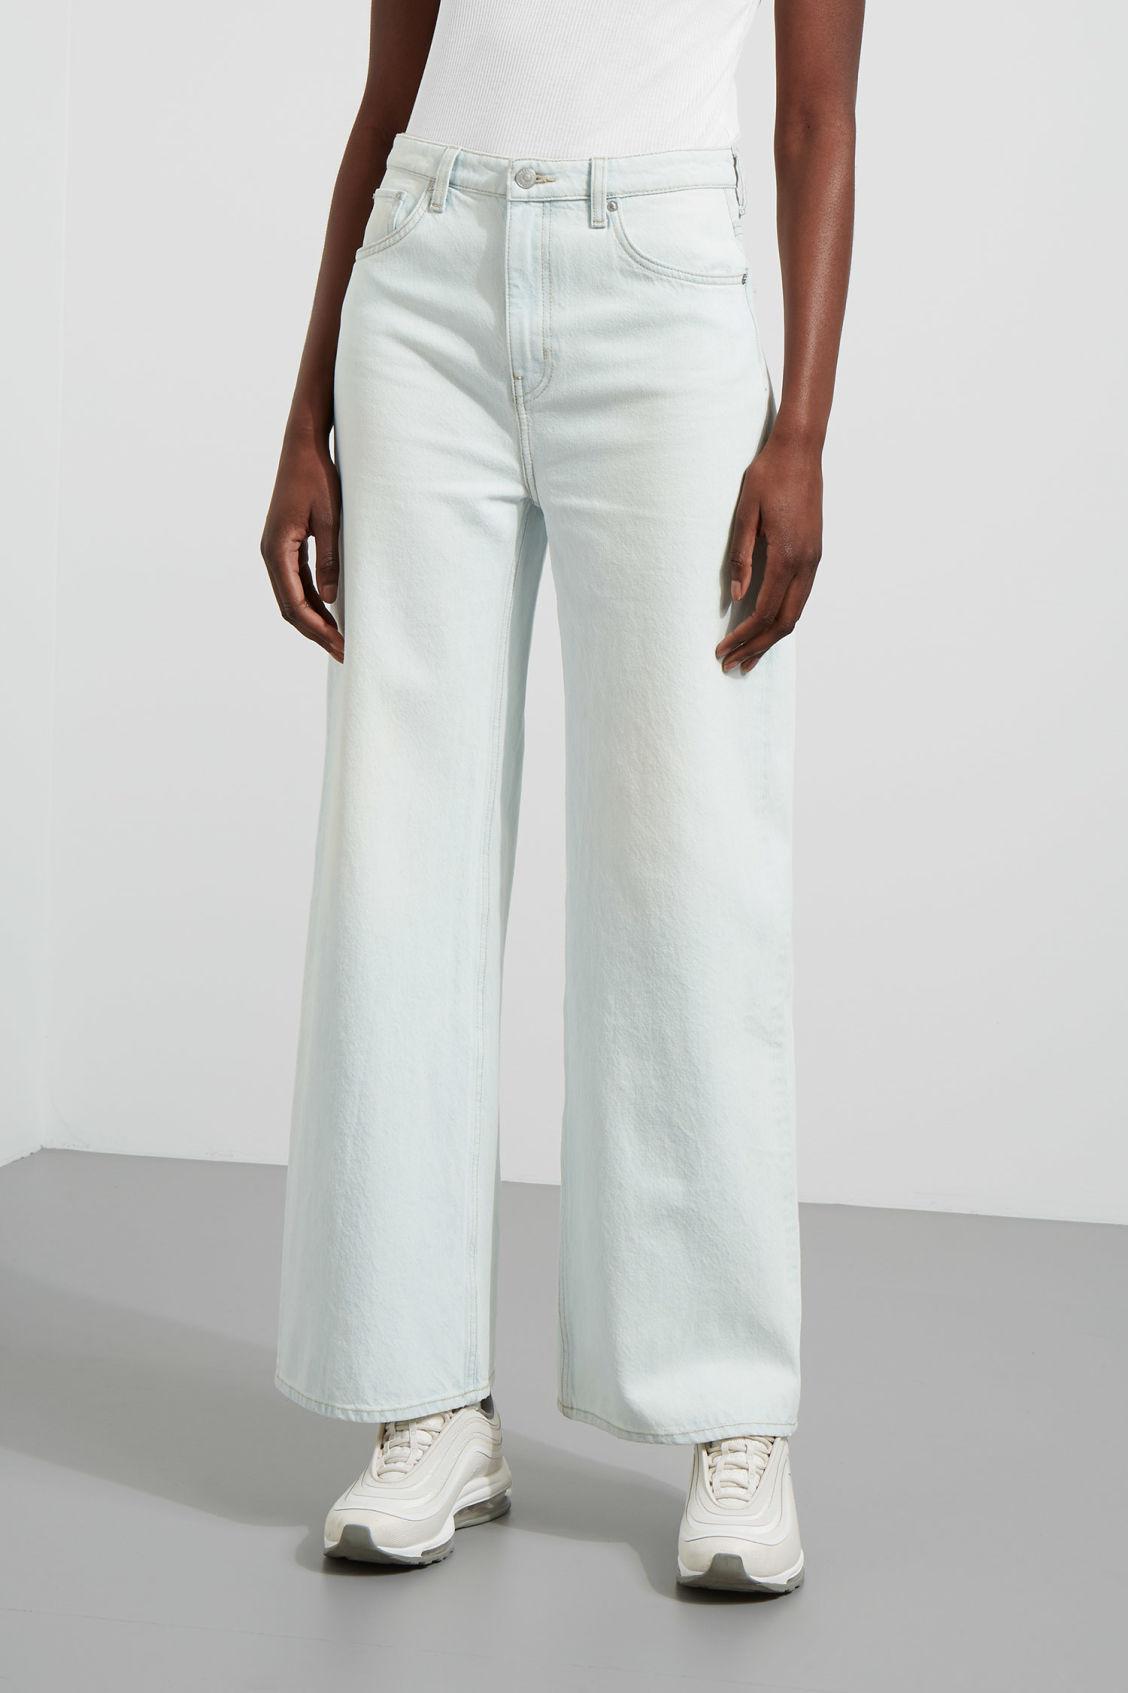 WeekdayACE - Flared Jeans - bleached standard fR1FS